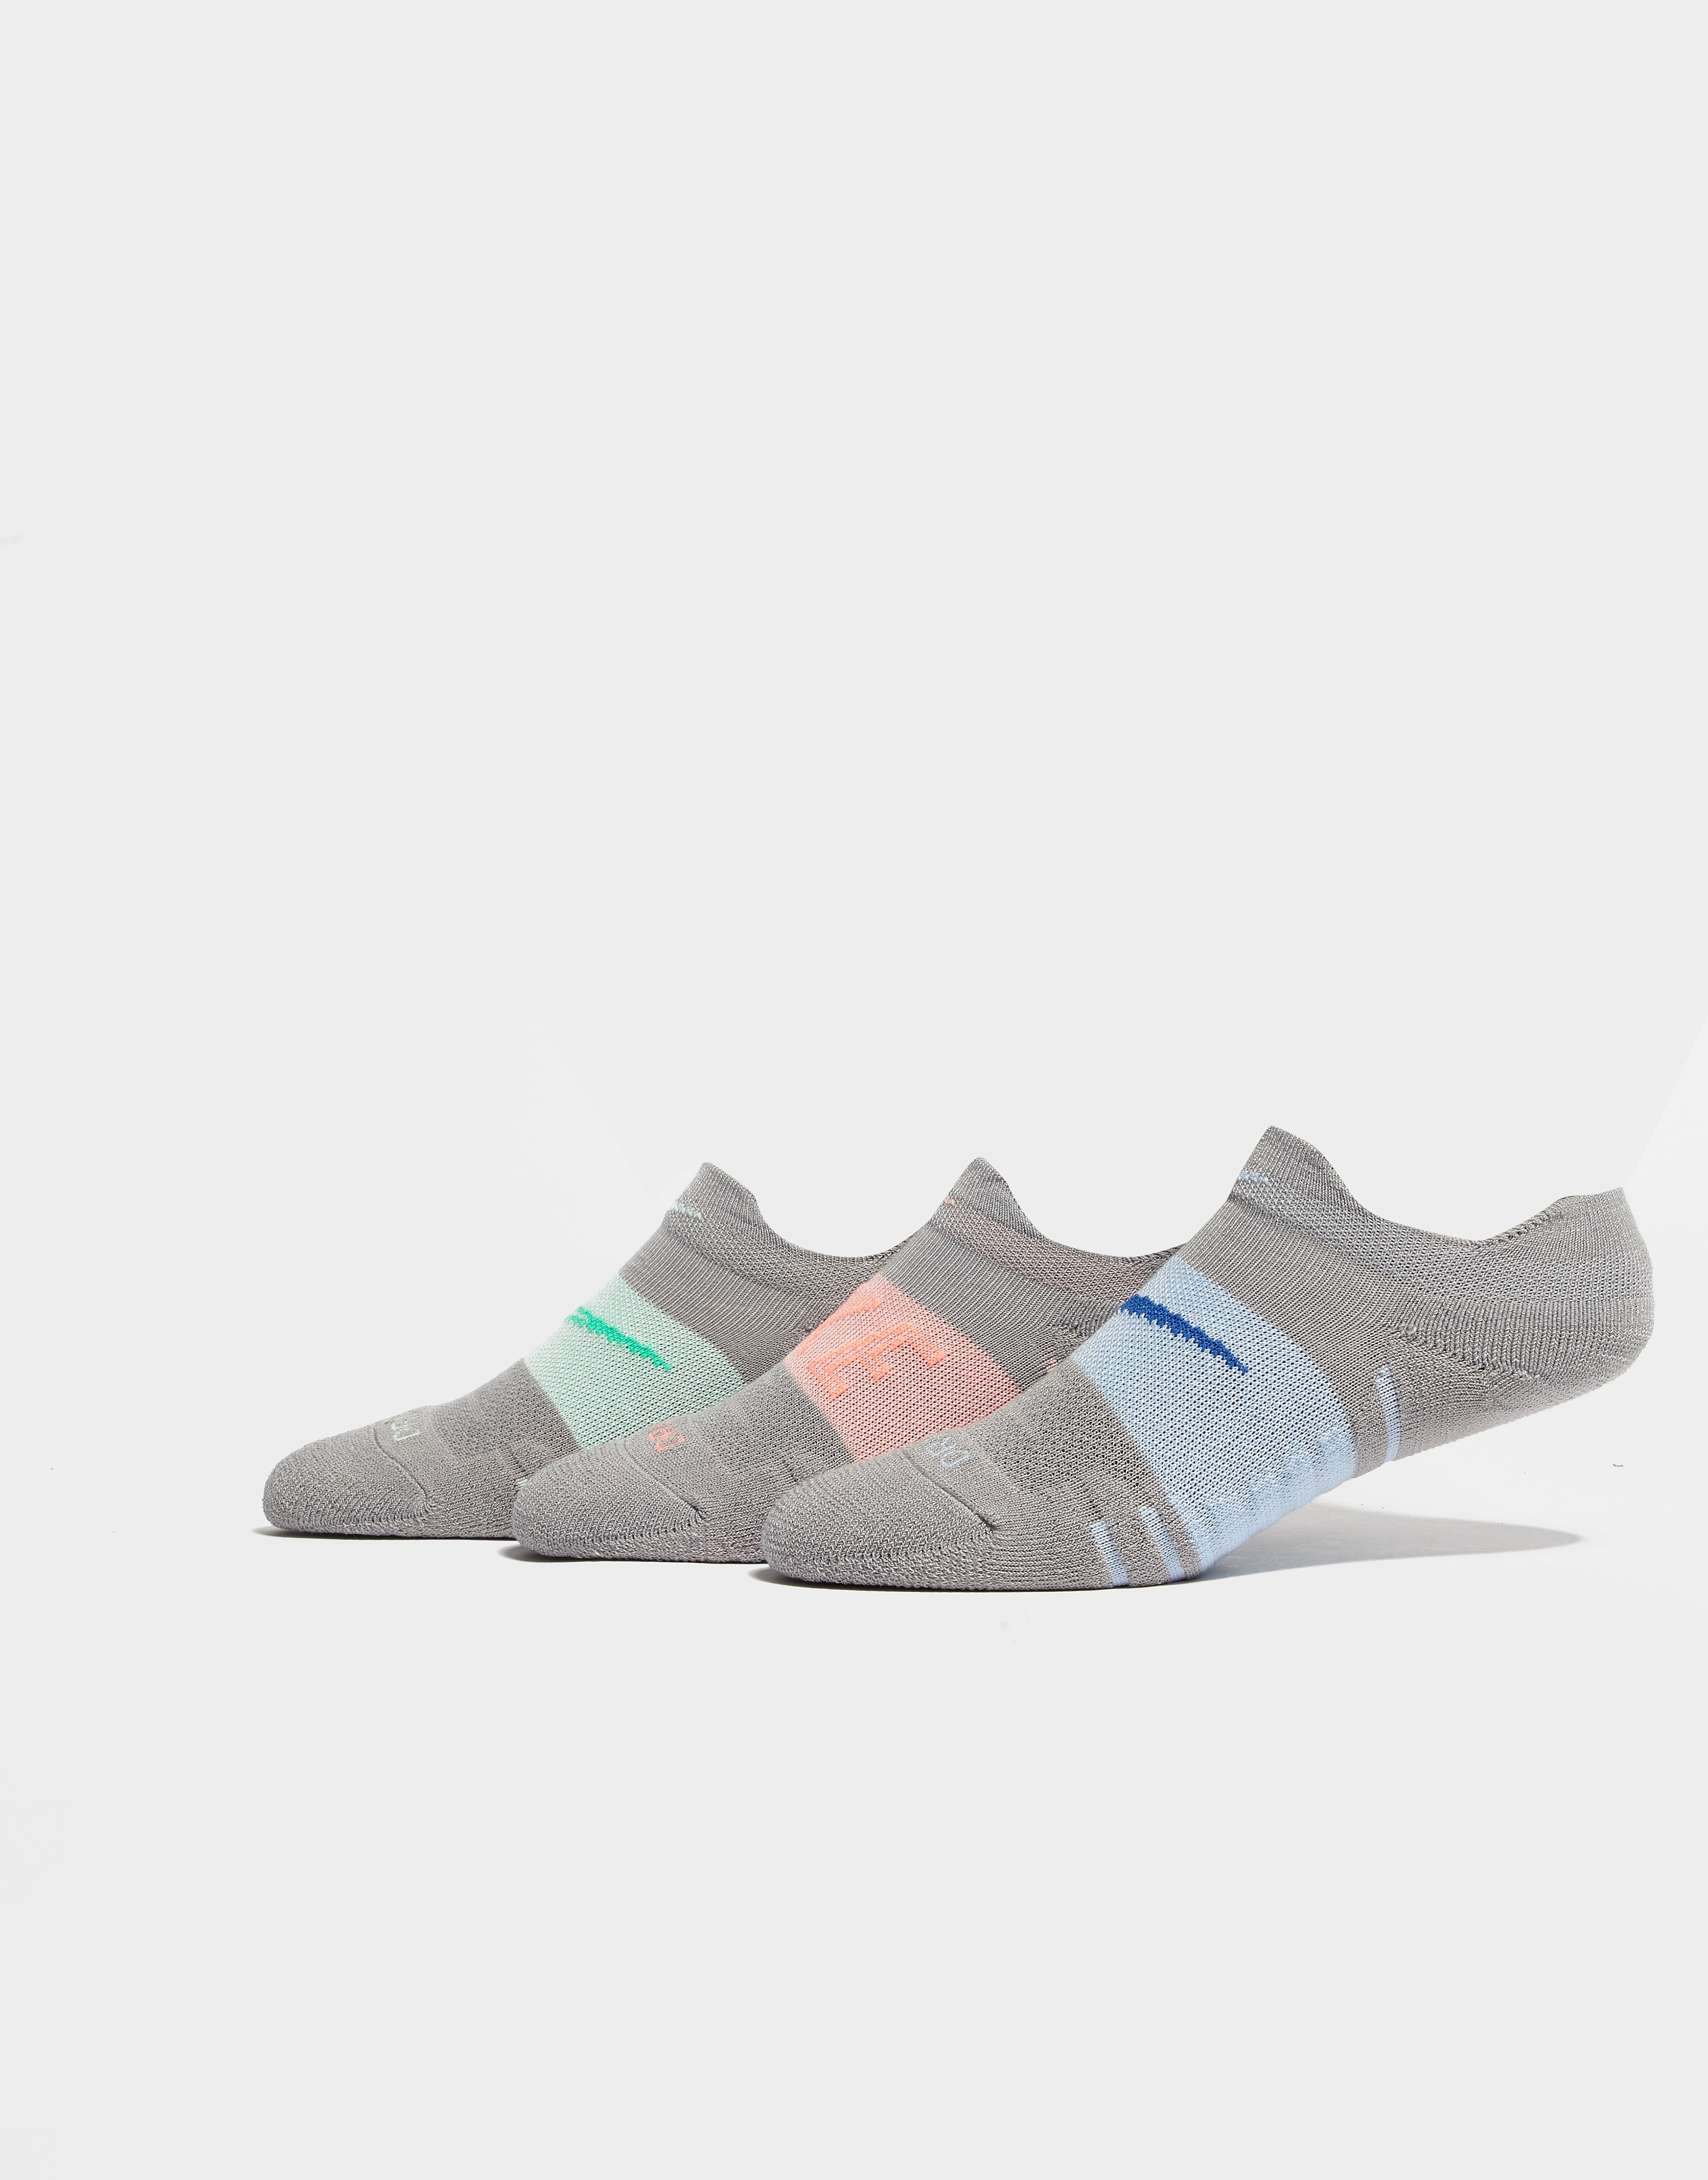 Nike pack de 3 calcetines Performance Lightweight